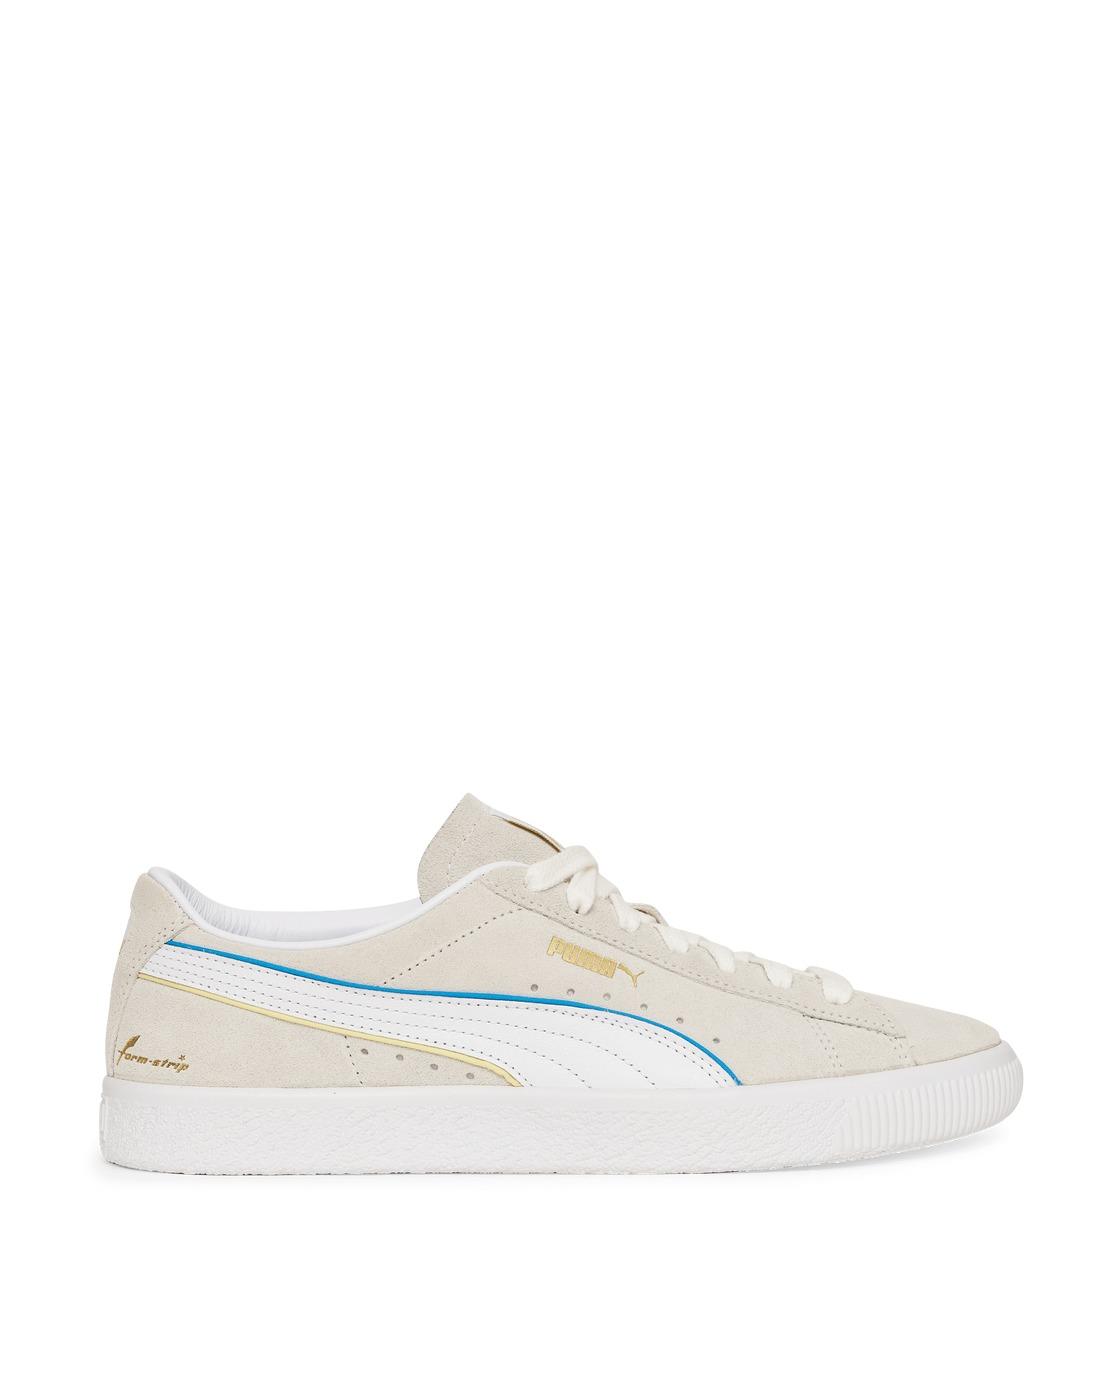 Photo: Puma Suede Vtg Rdl Fs Sneakers Vaporous Gray Puma White